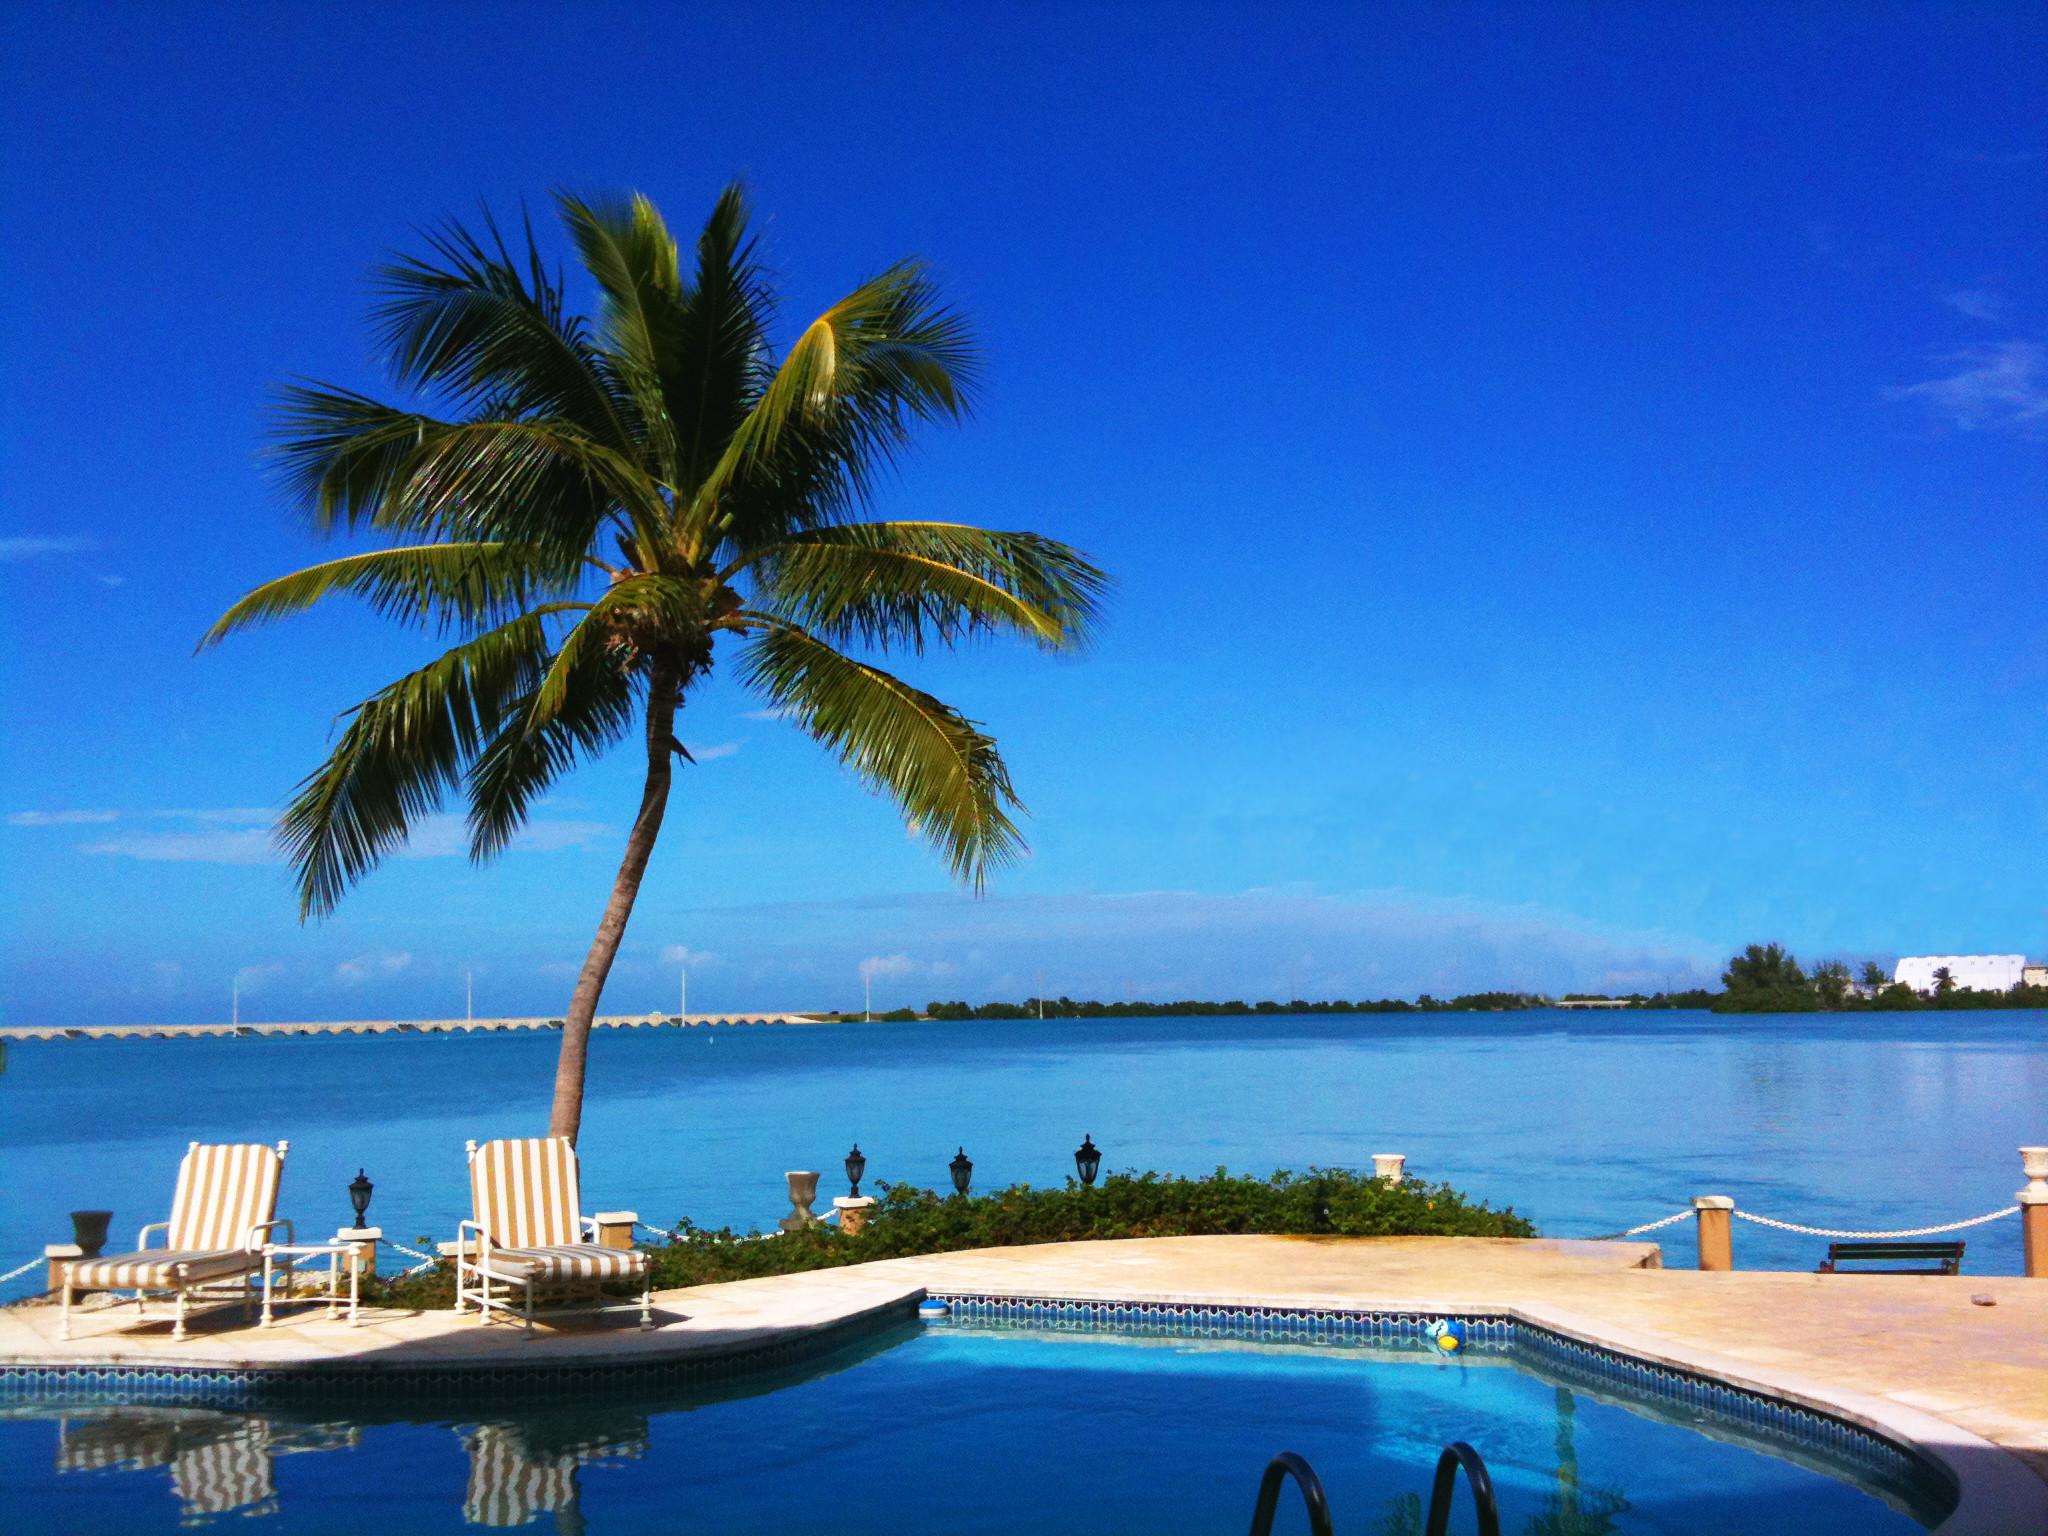 … Florida Keys oceanfront home for sale, Duck Key Florida …